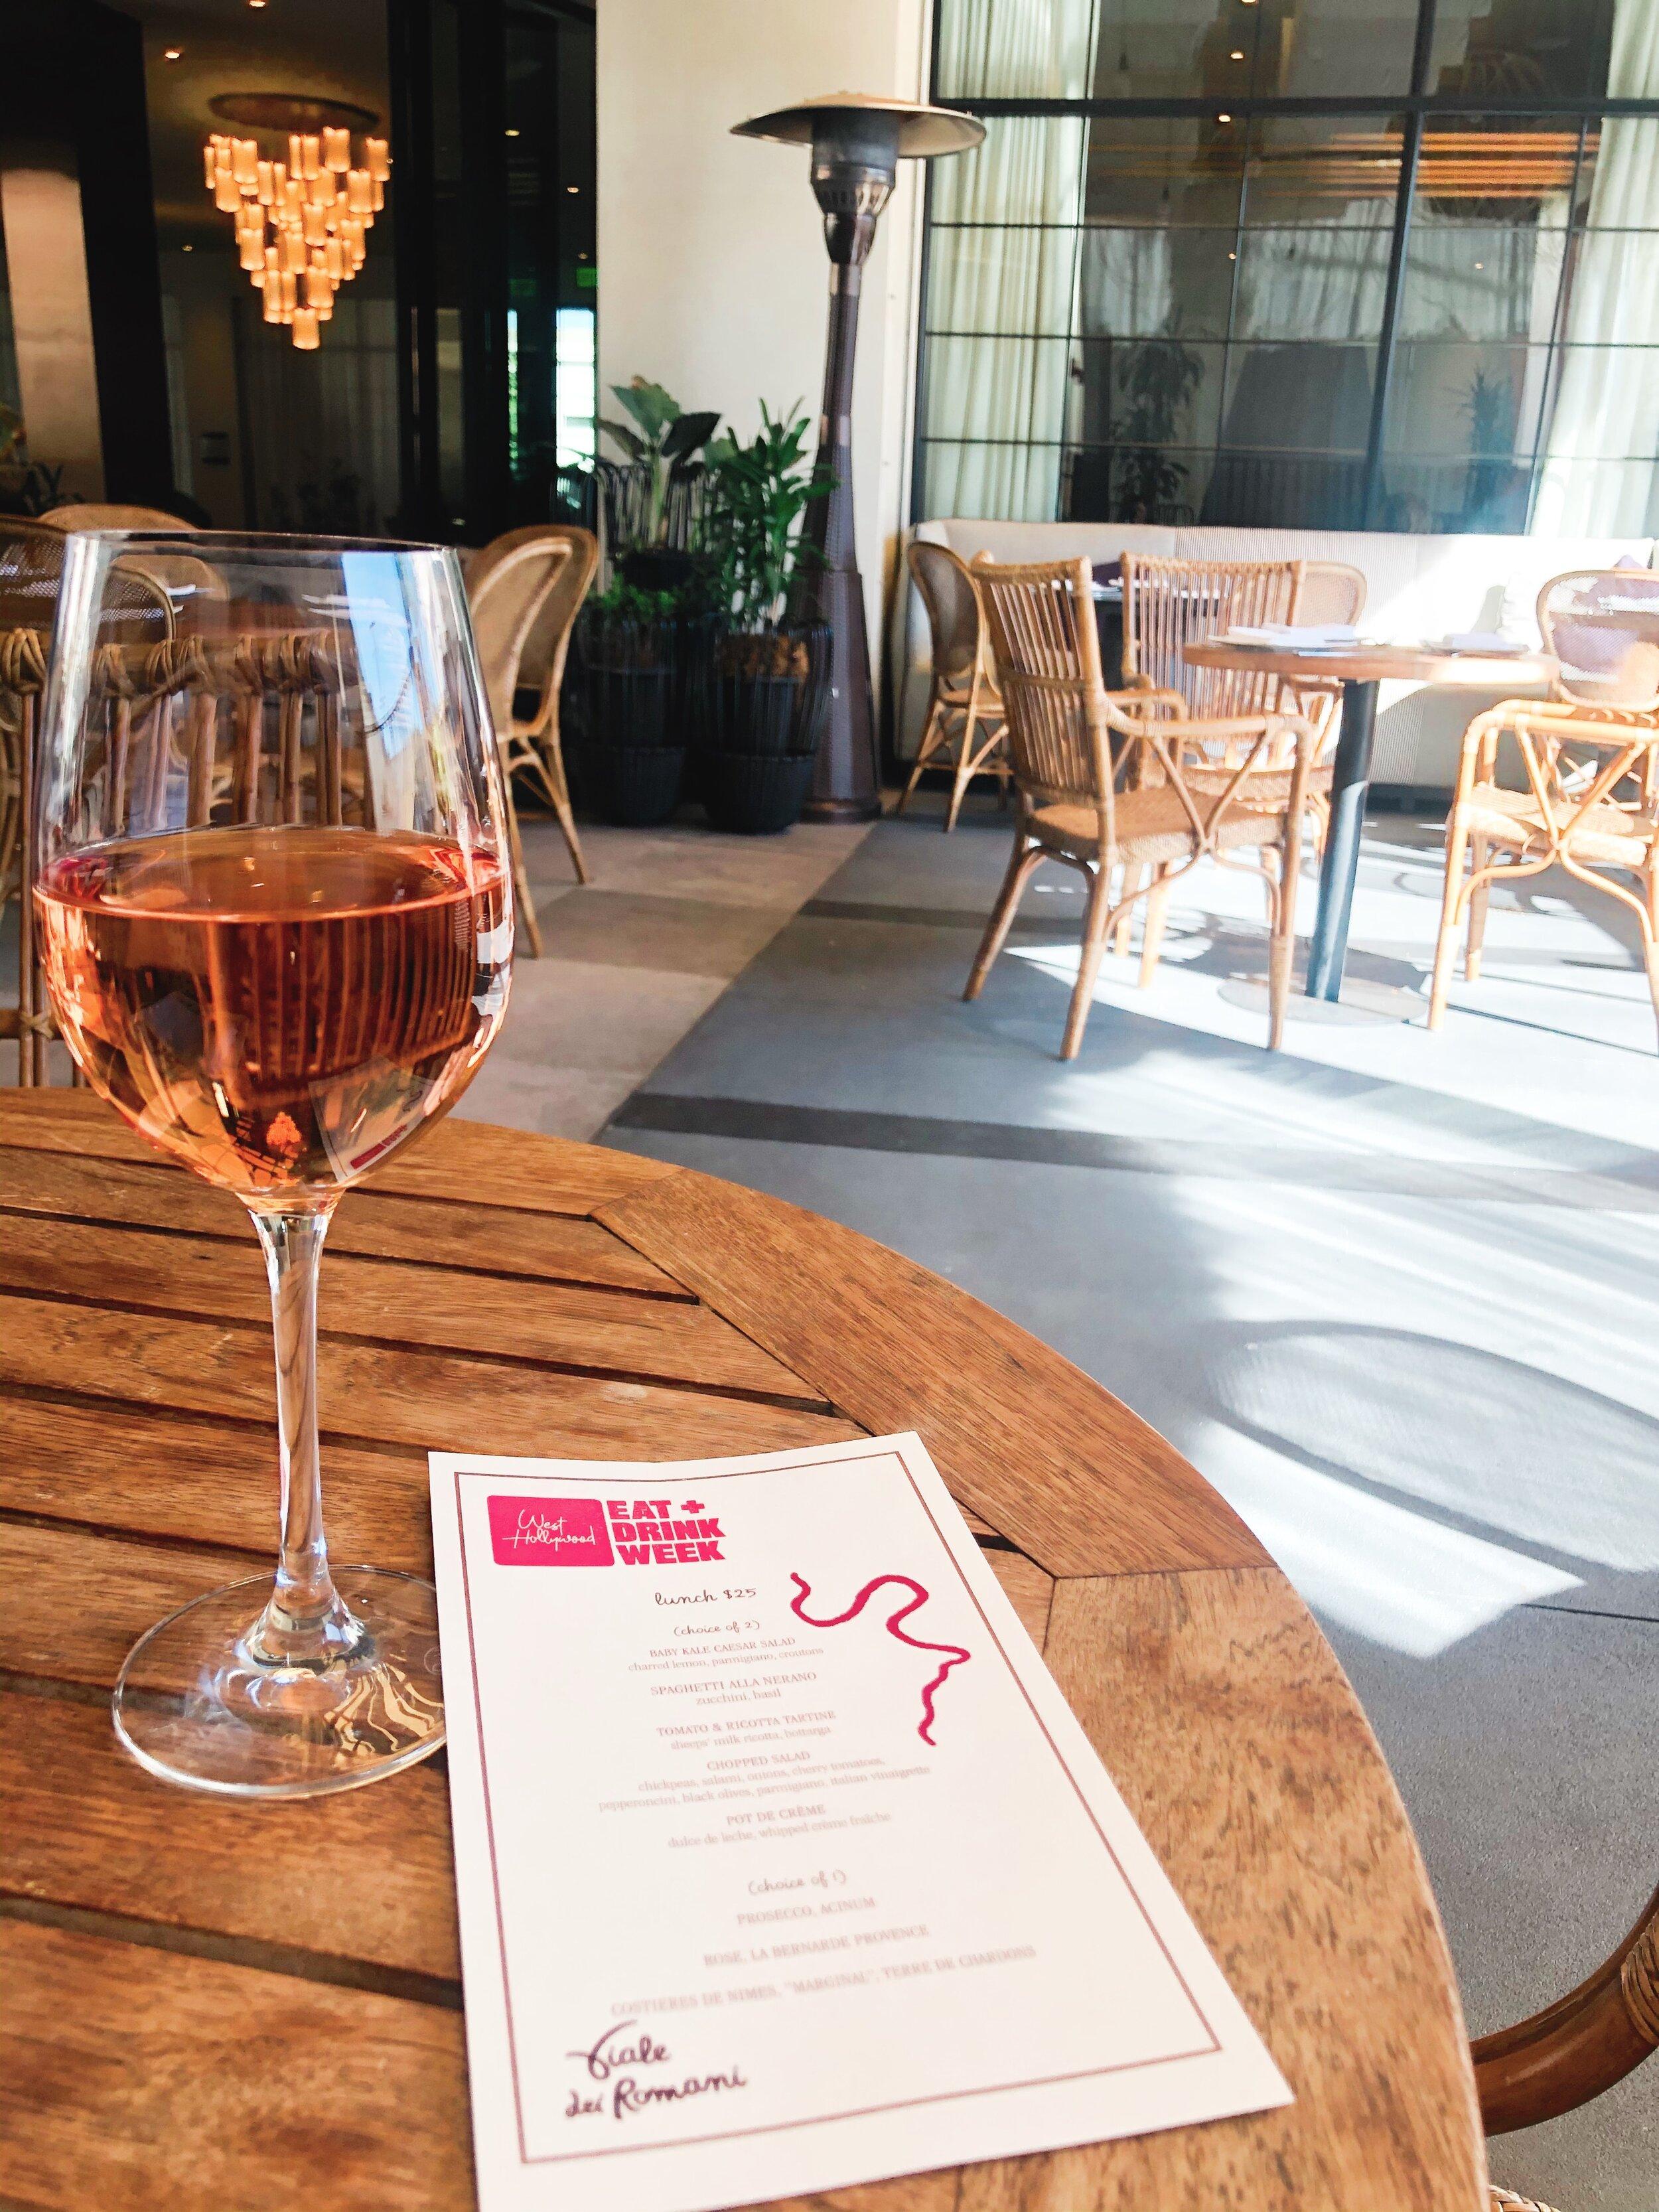 Viale Dei Romani - The Gilded Bellini - The Kimpton La Peer Hotel